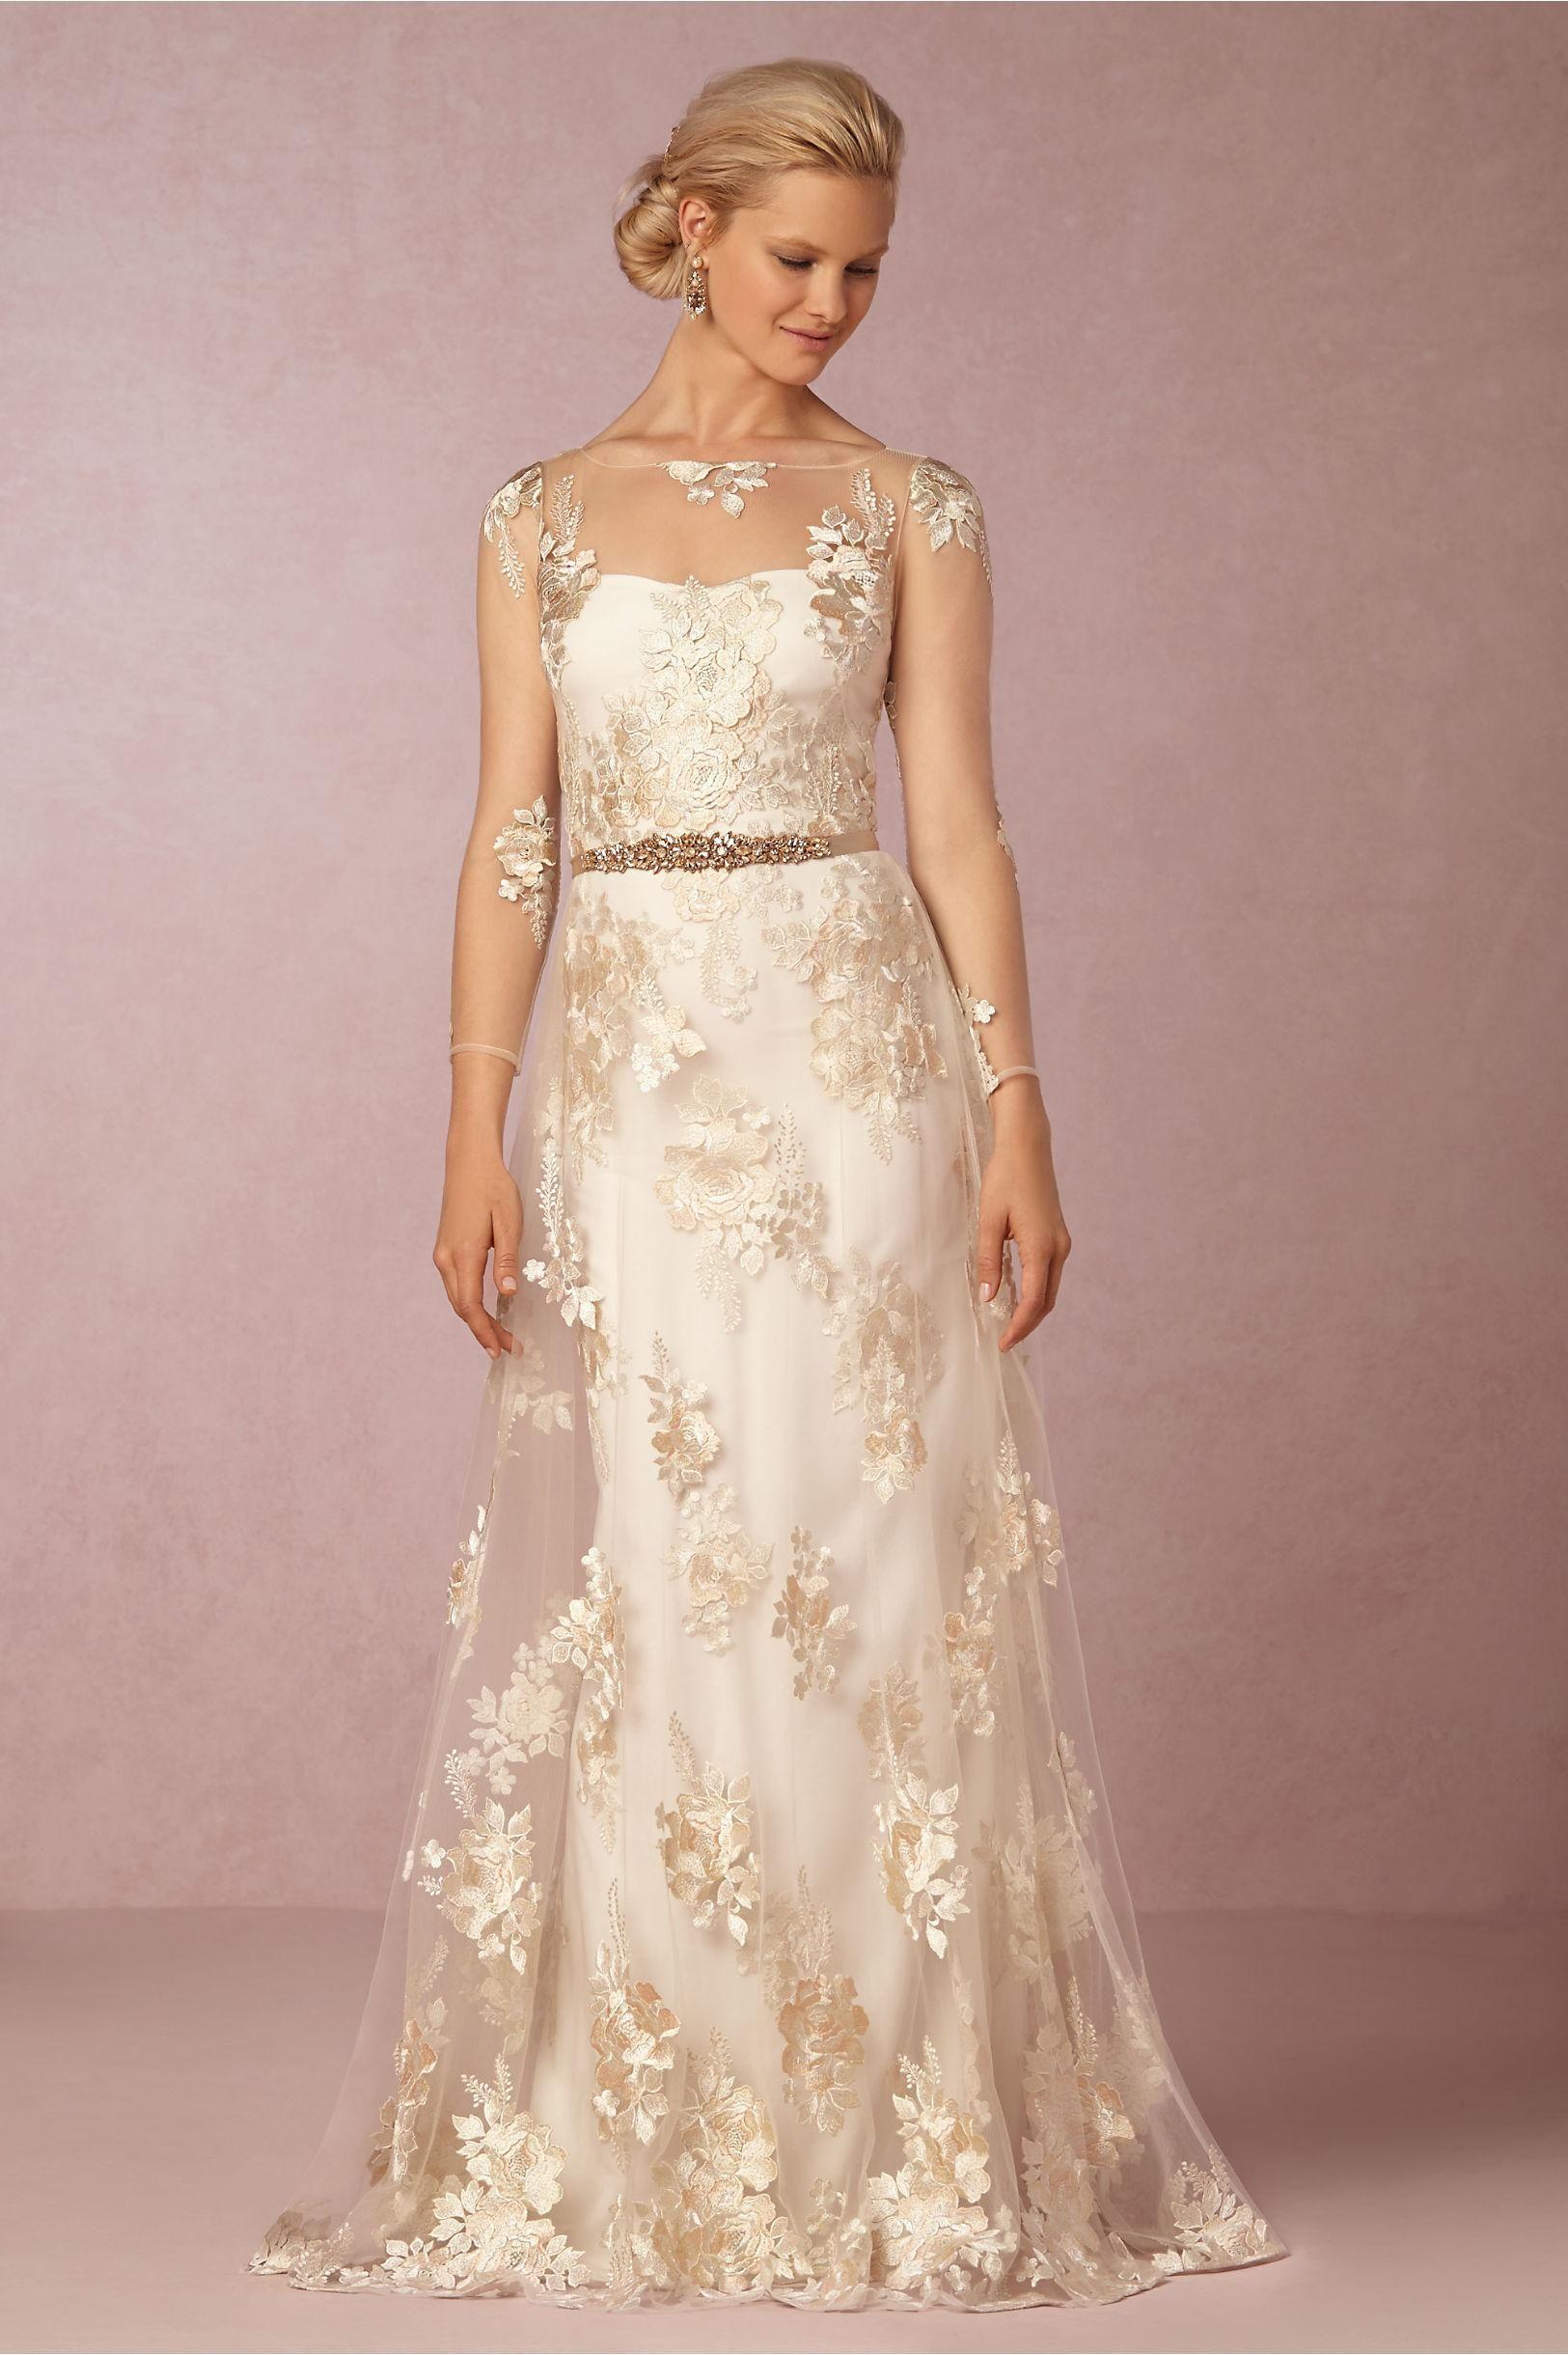 Bhldn sheer wedding dresses with illusion long sleeves jewel